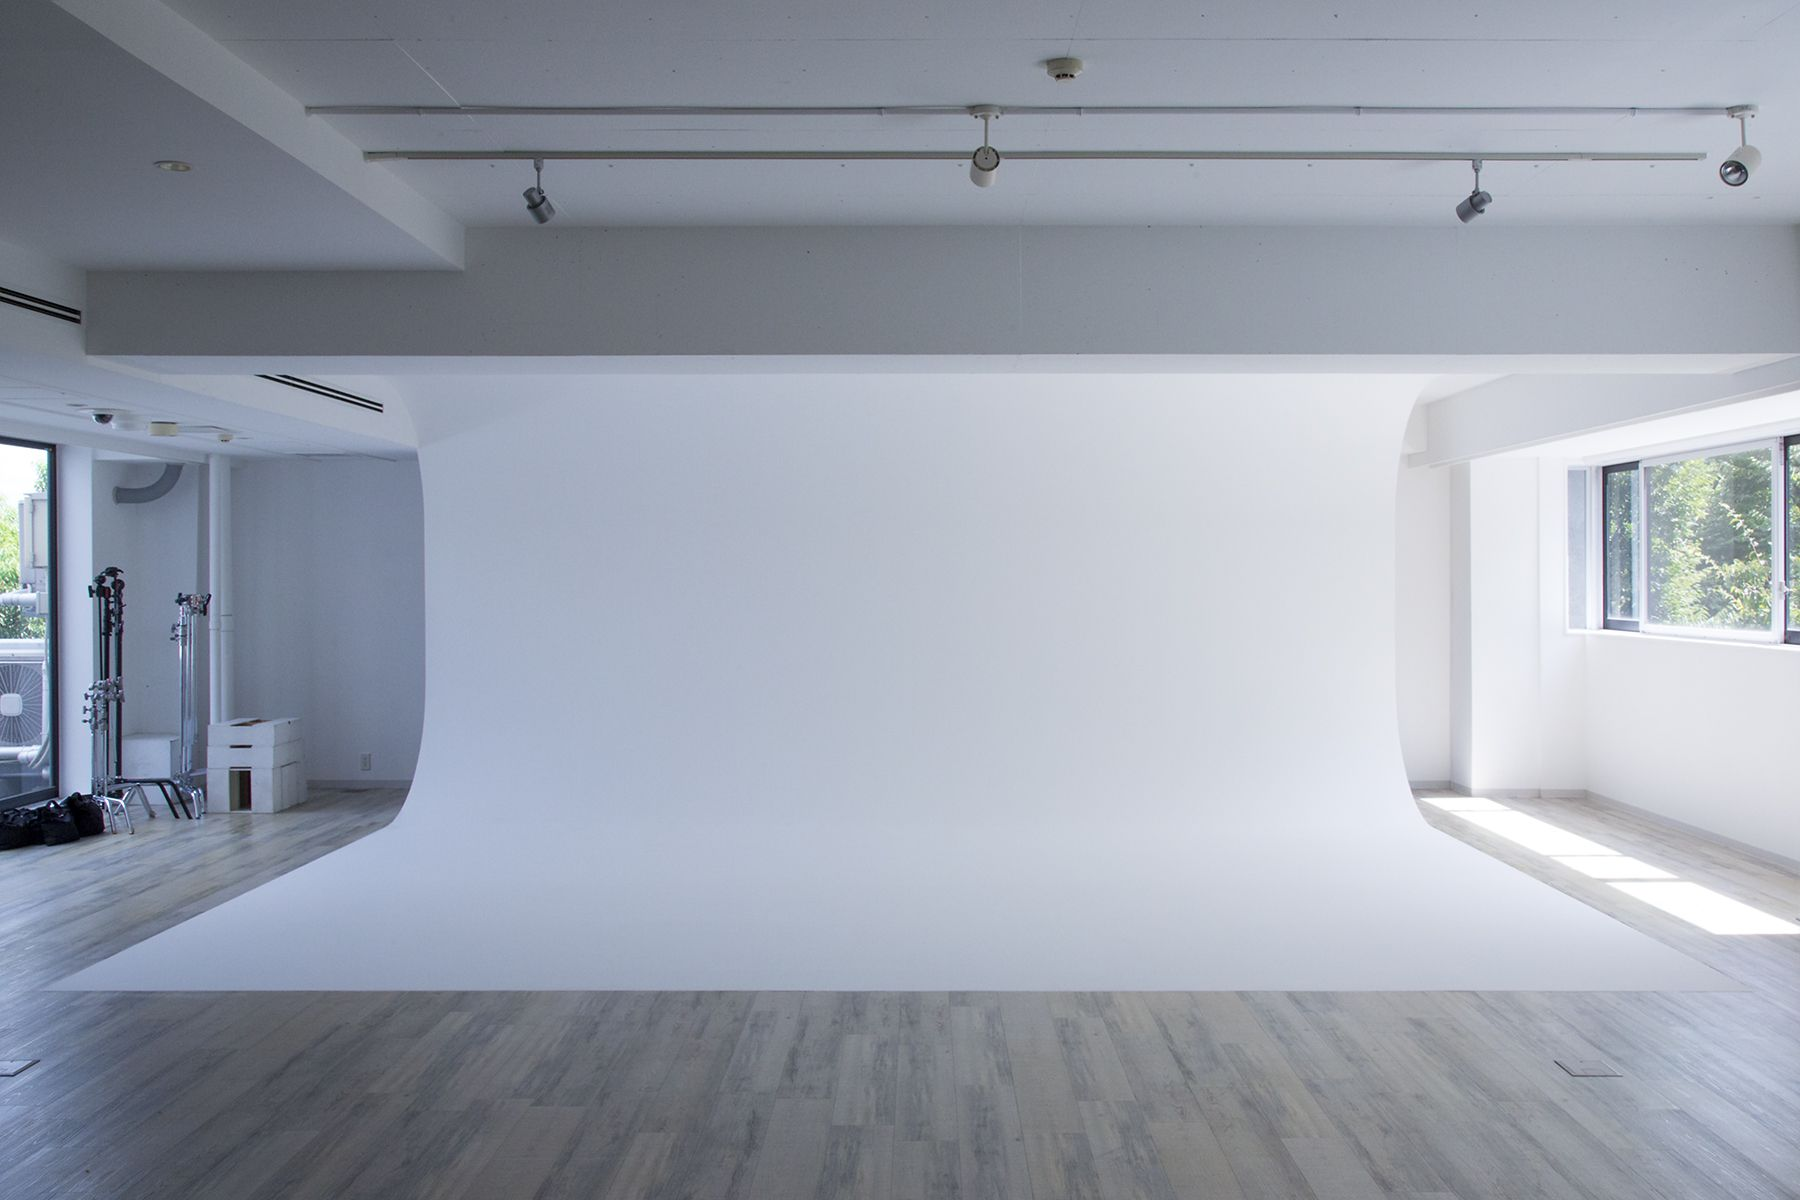 Studio TERRANOVA Bst  白ホリ+ハウススタジオ  (スタジオテラノヴァ)7m弱白ホリゾント方面 / 東方角